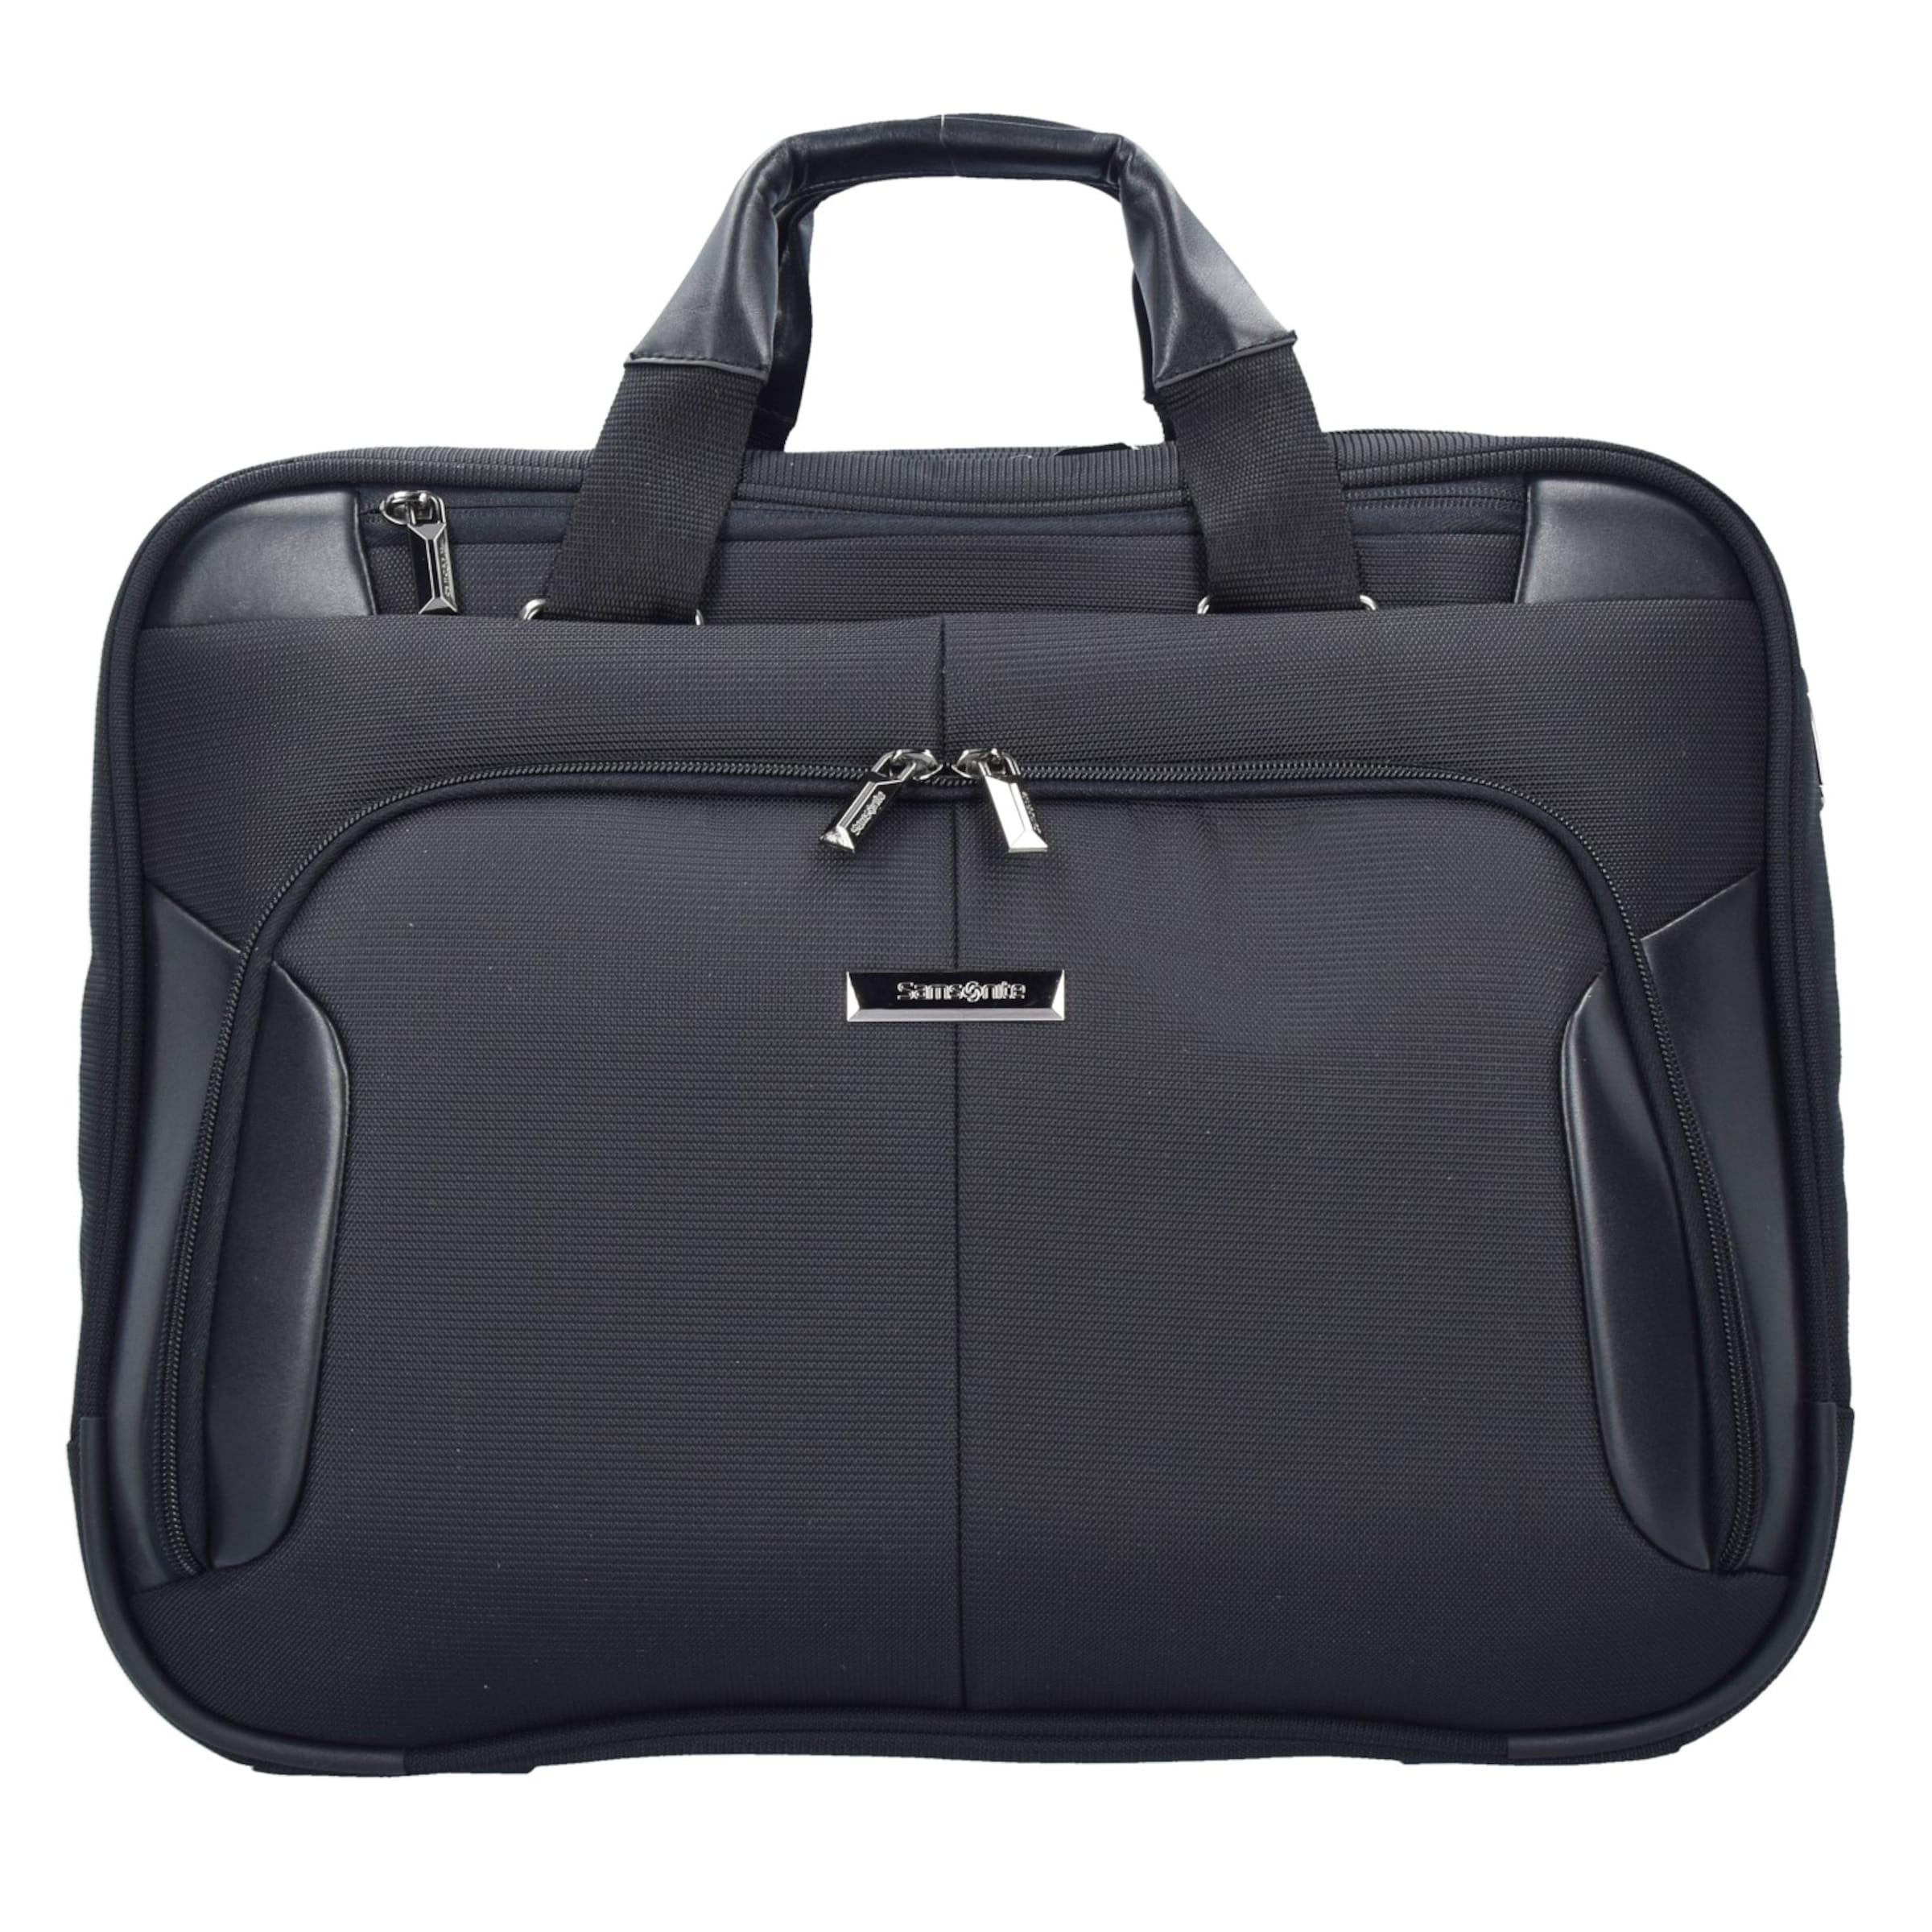 44 SAMSONITE Laptopfach SAMSONITE XBR cm XBR Aktentasche qOIIvw